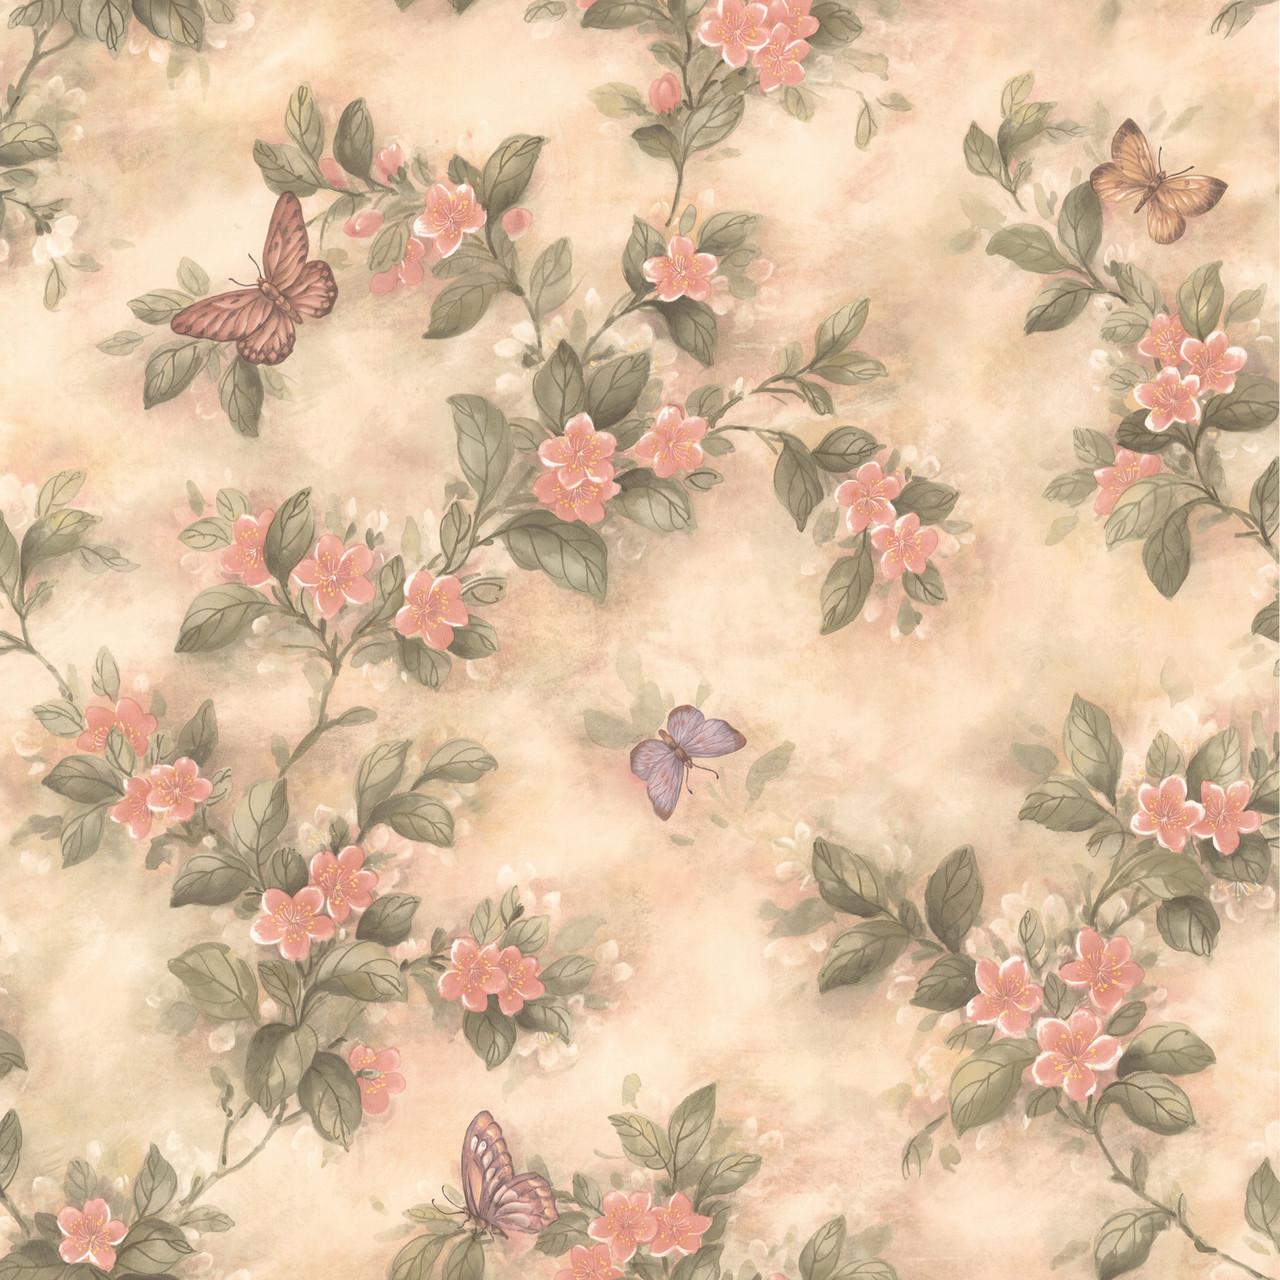 436 38573 Lisa Peach Butterfly Floral Wallpaper